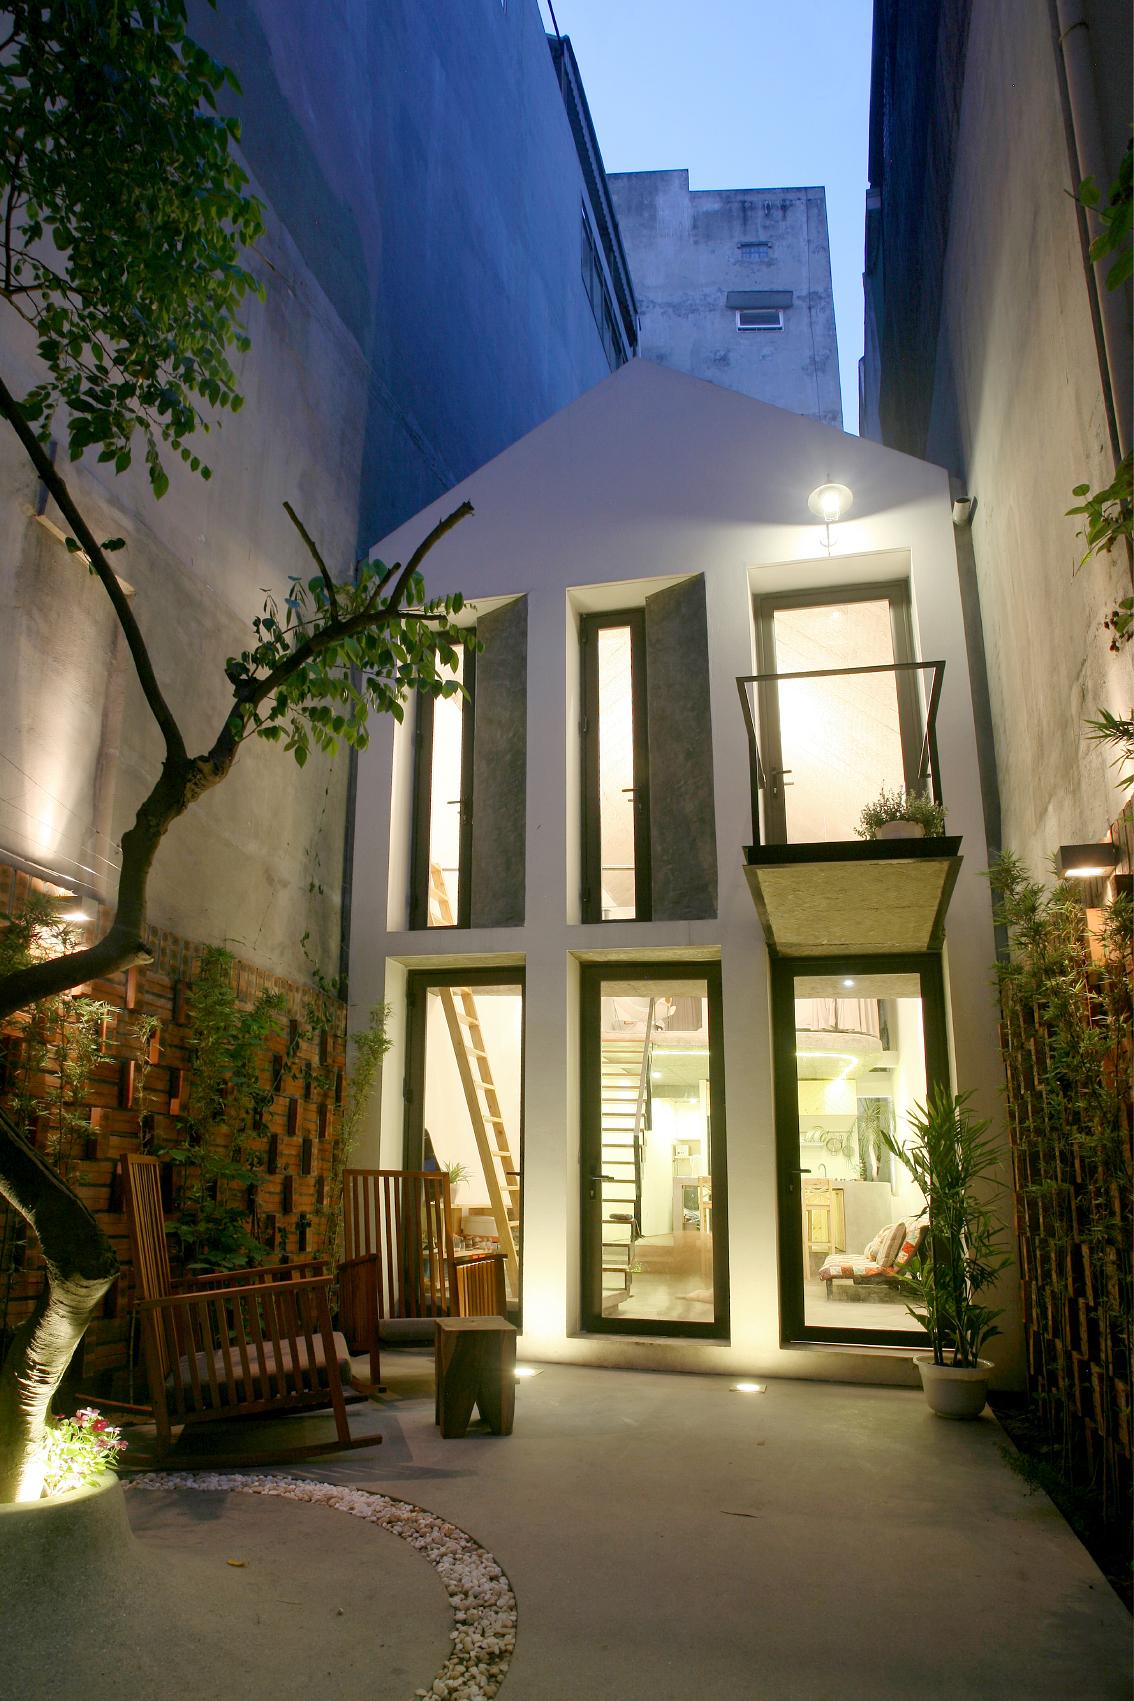 Gallery of maison t nghia architect 16 for 7 a la maison episodes